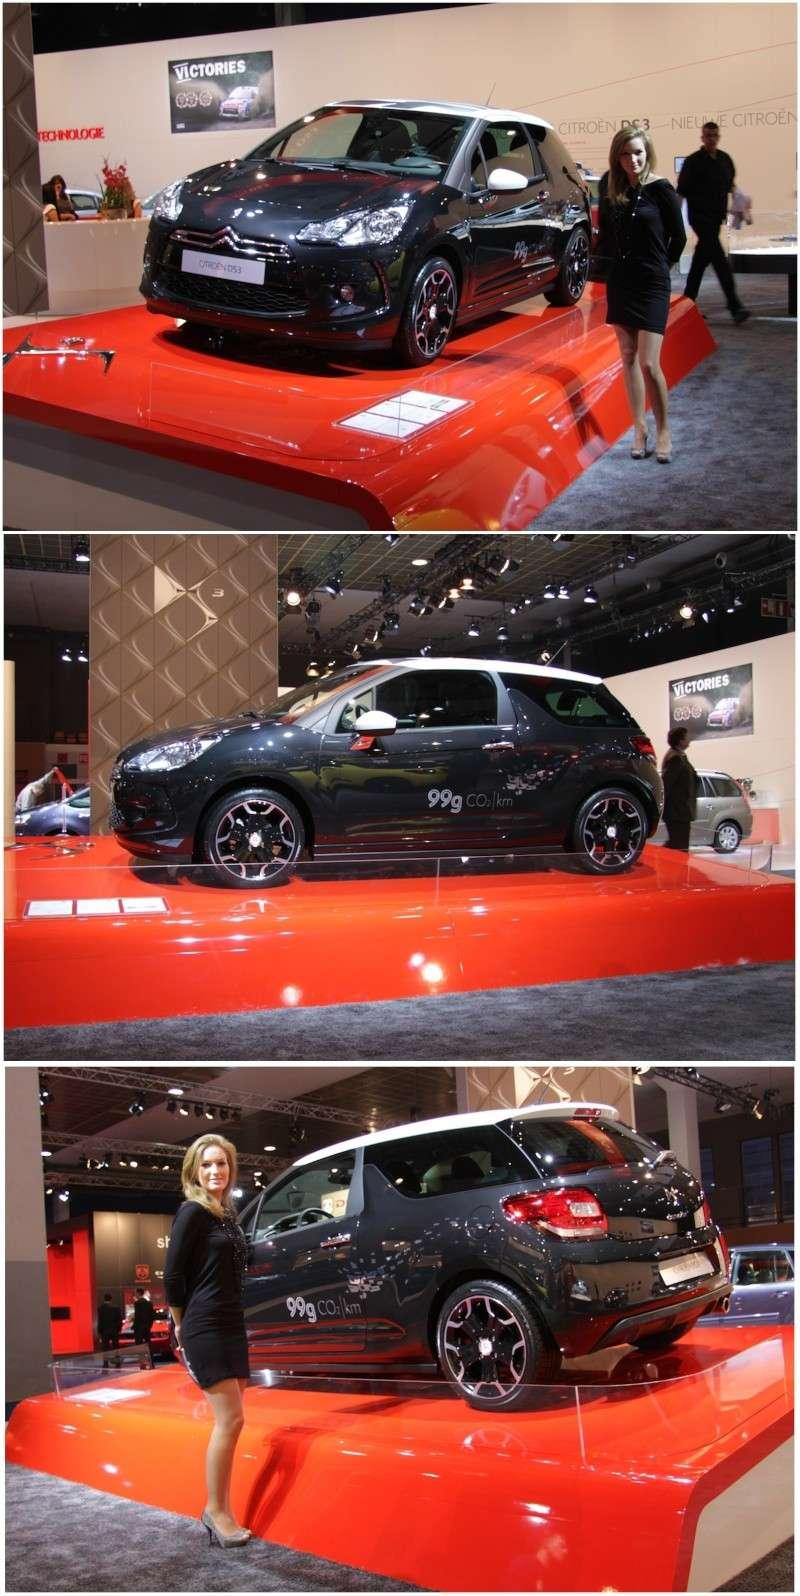 [SALON] Brussels 2010 - European Motor Show 111